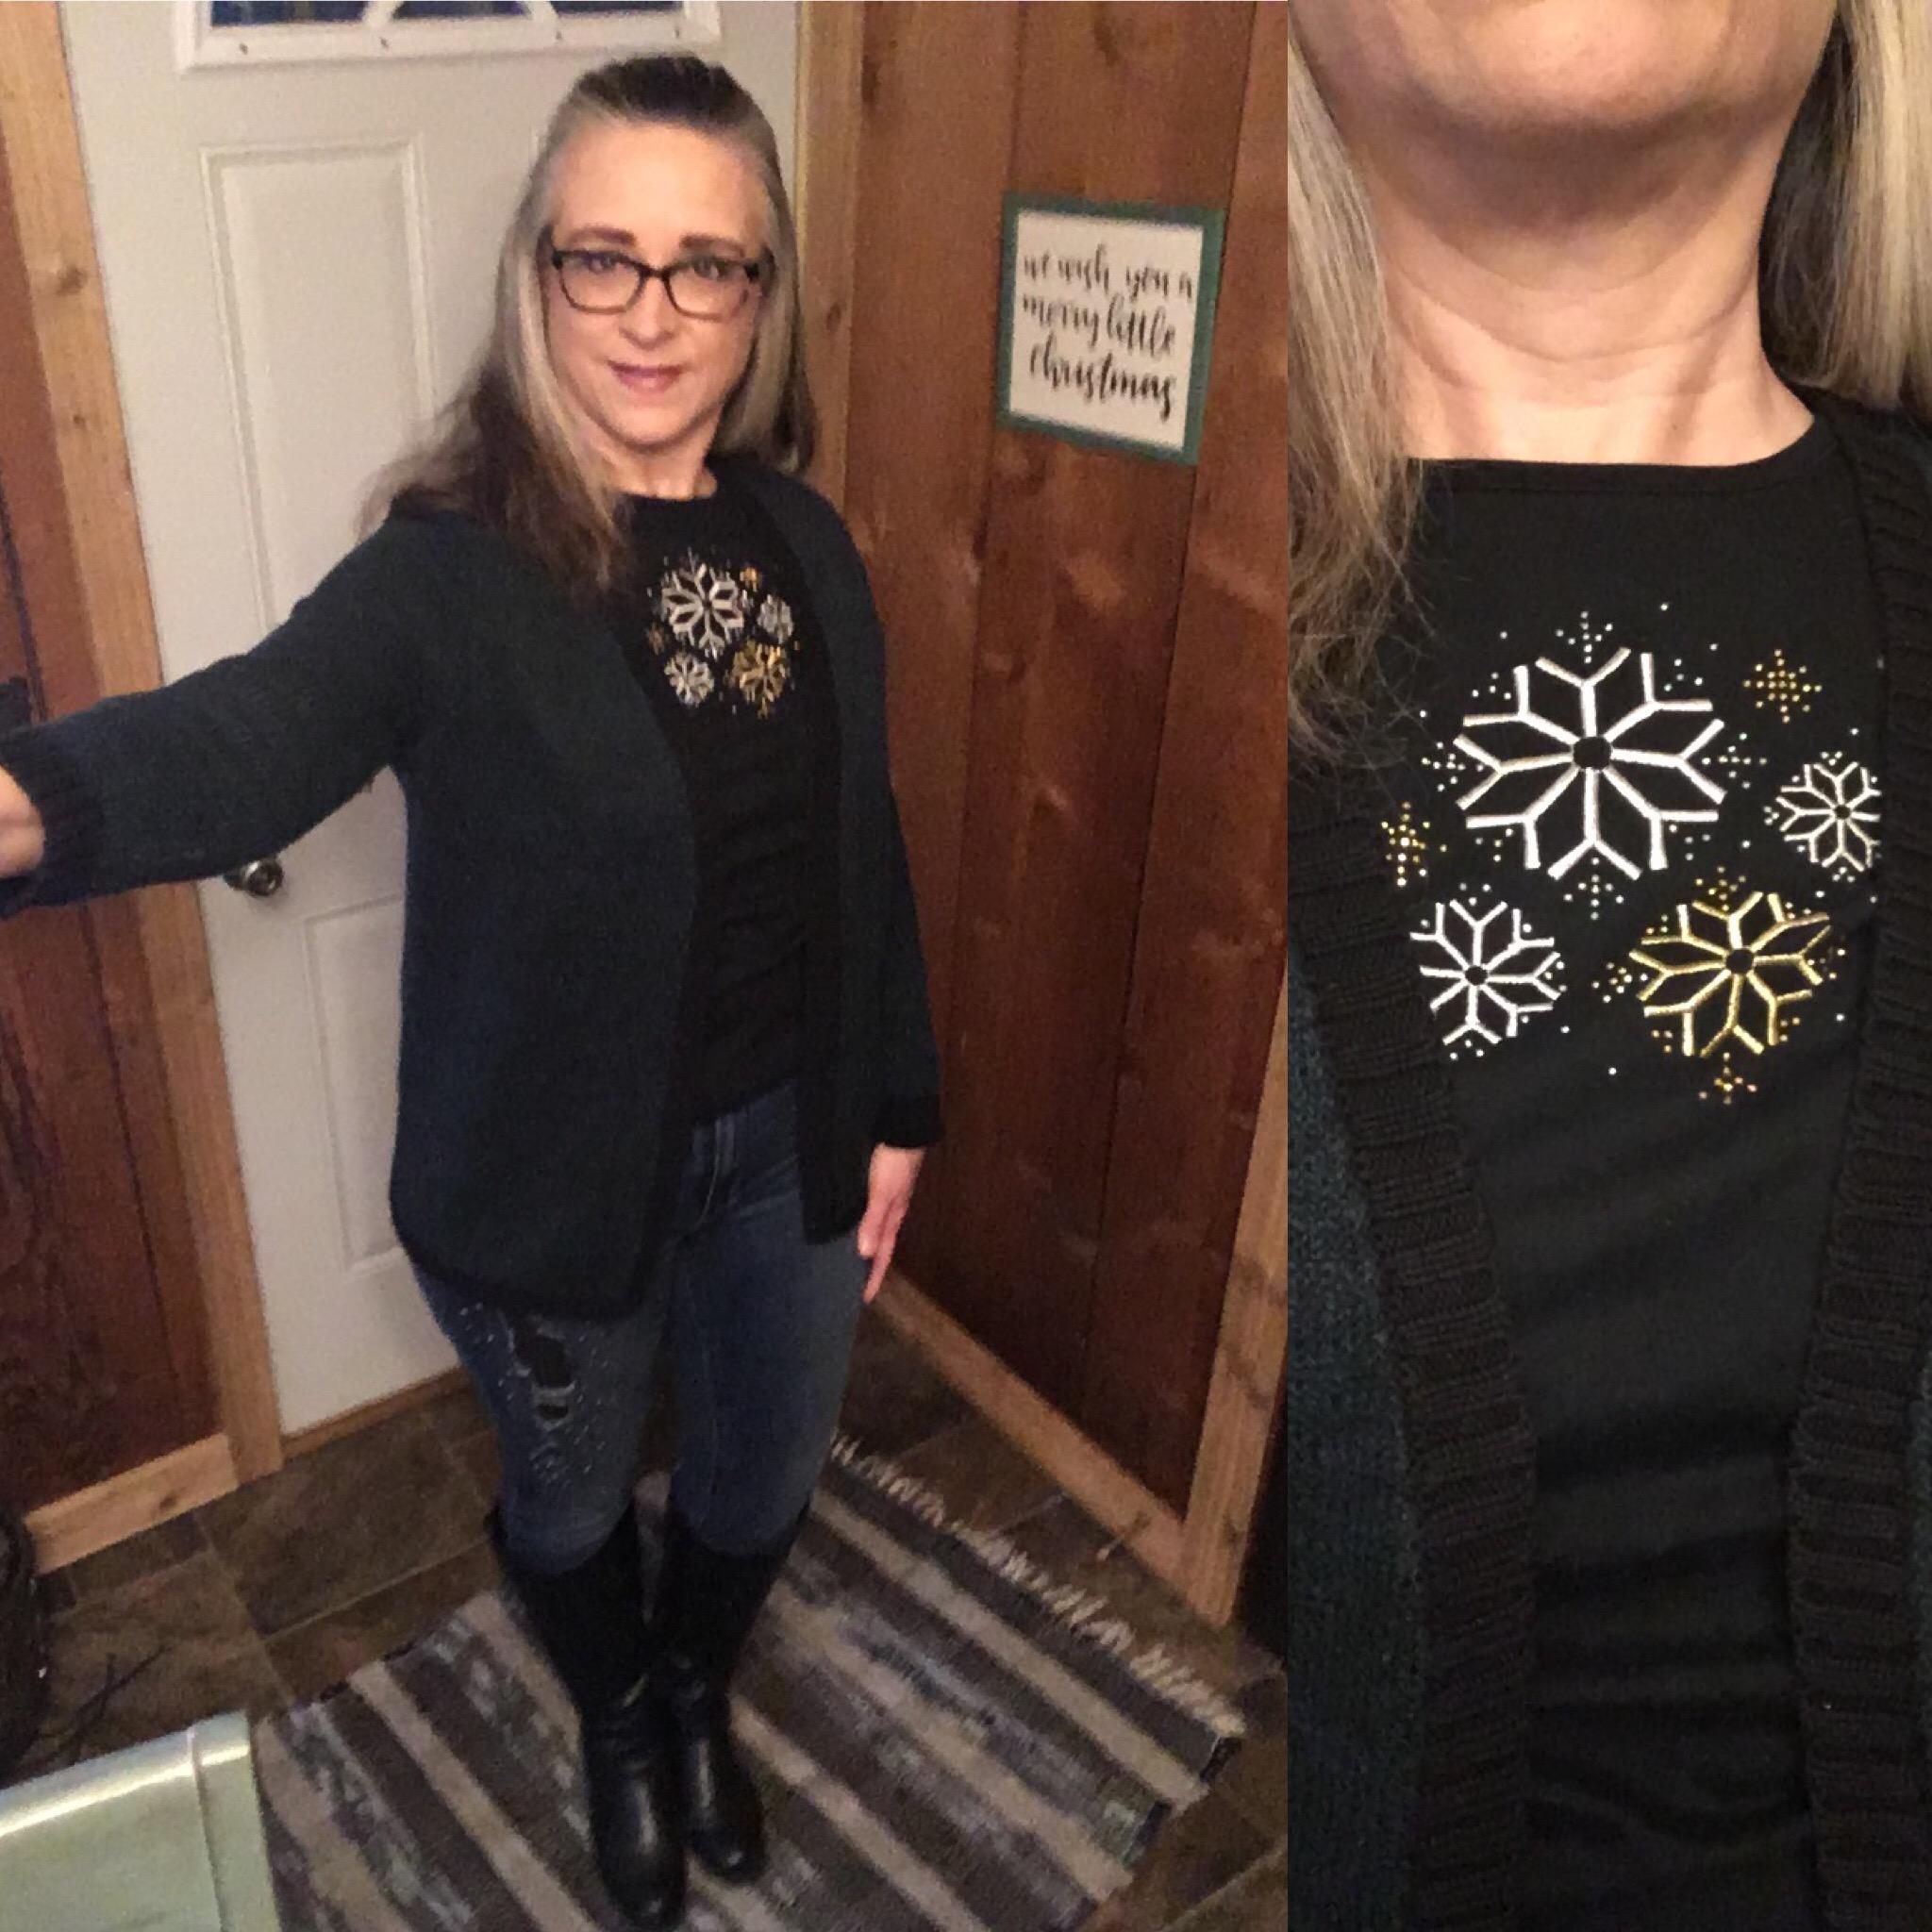 20 Days of Christmas - Metallic Snowflake sweater